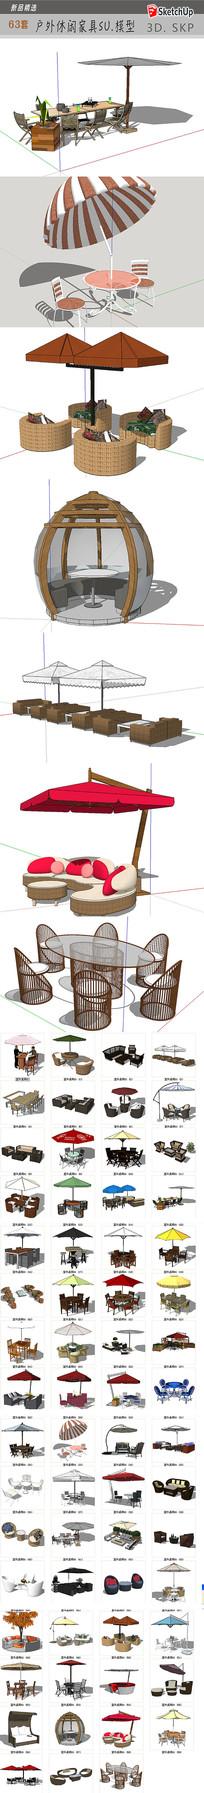 3D遮阳伞模型 skp